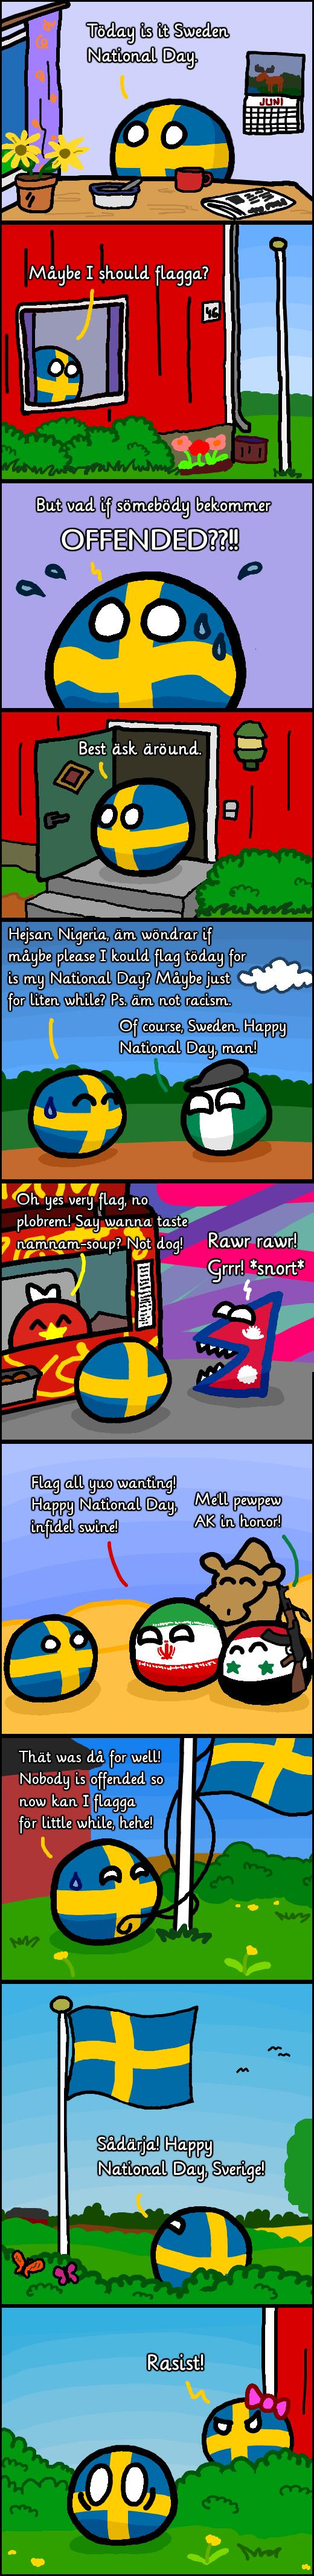 Mildly HDL Polandball Wednesday post